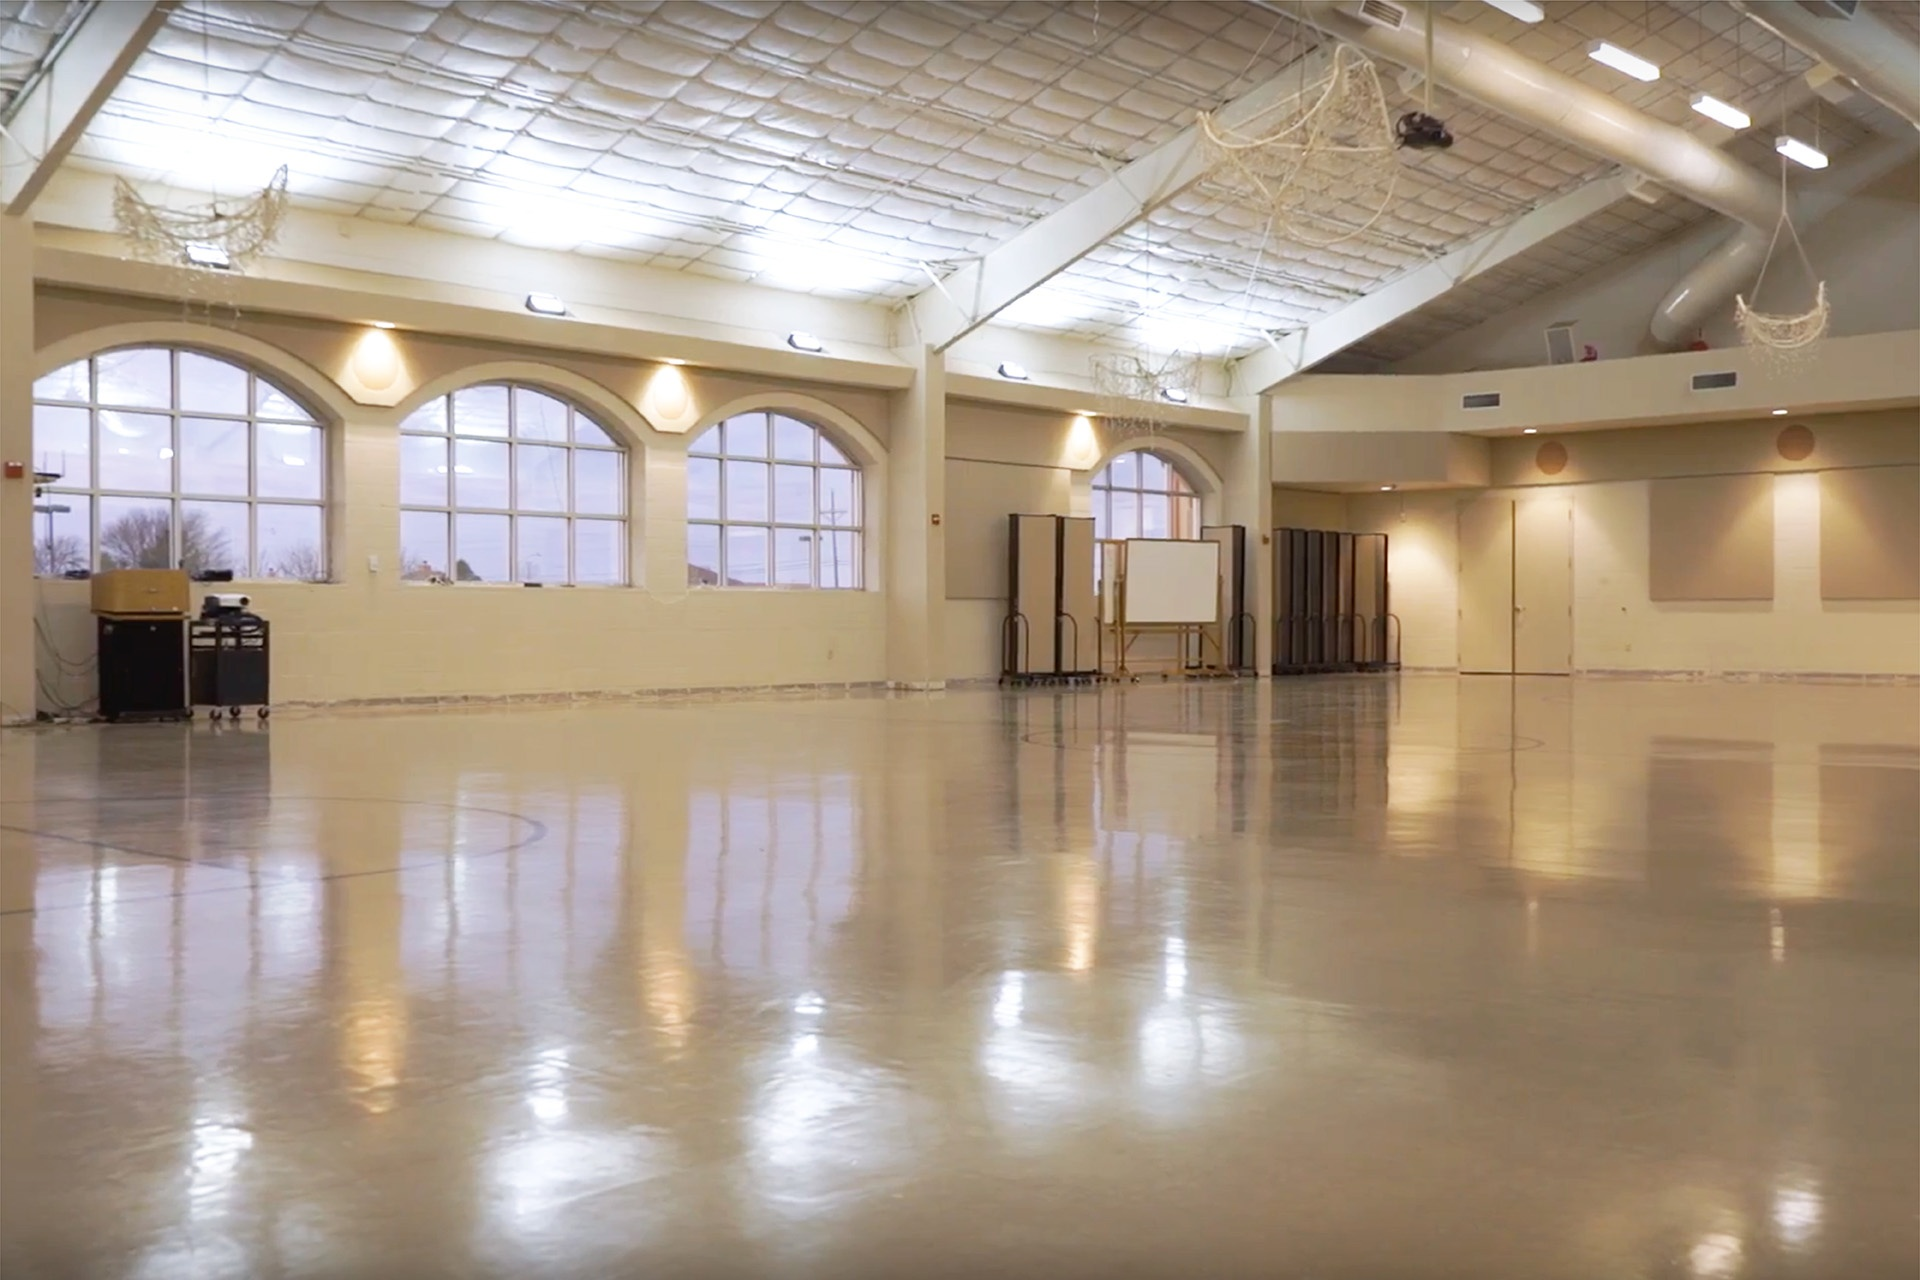 How Often Should I Strip & Re-Wax My Tile Floors?